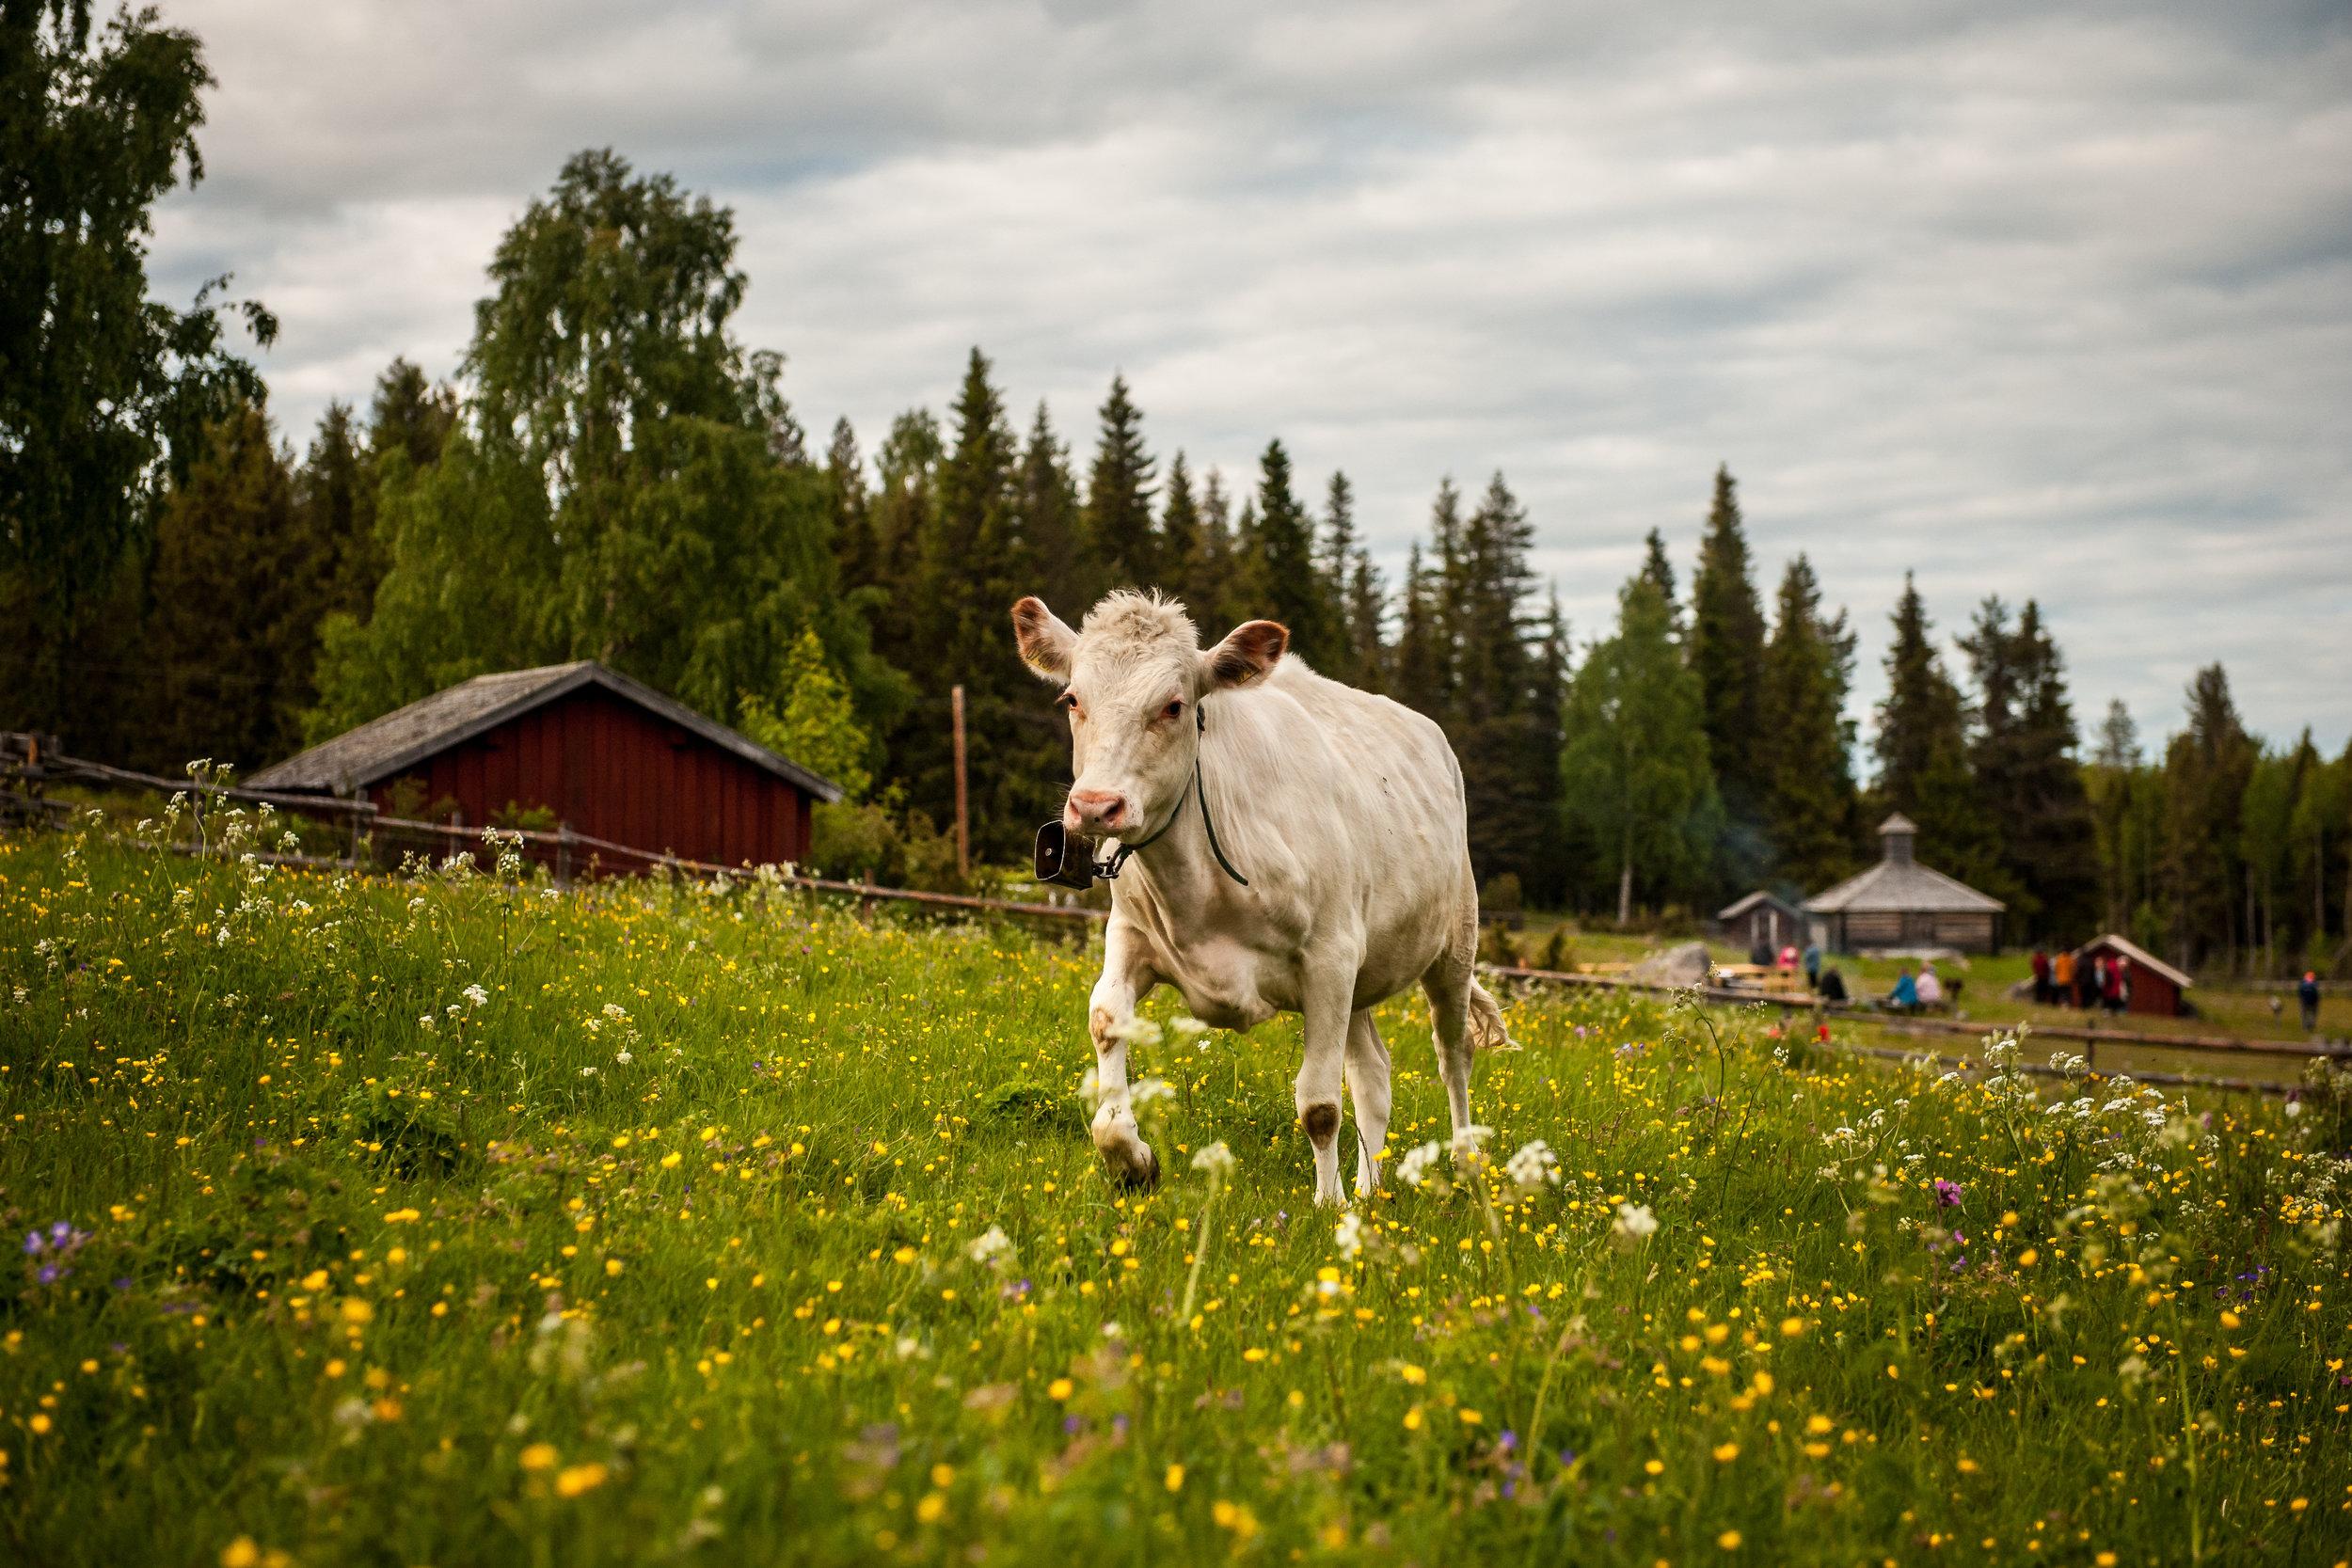 Hanhivittikko summer pasture Fäbod Övertorneå